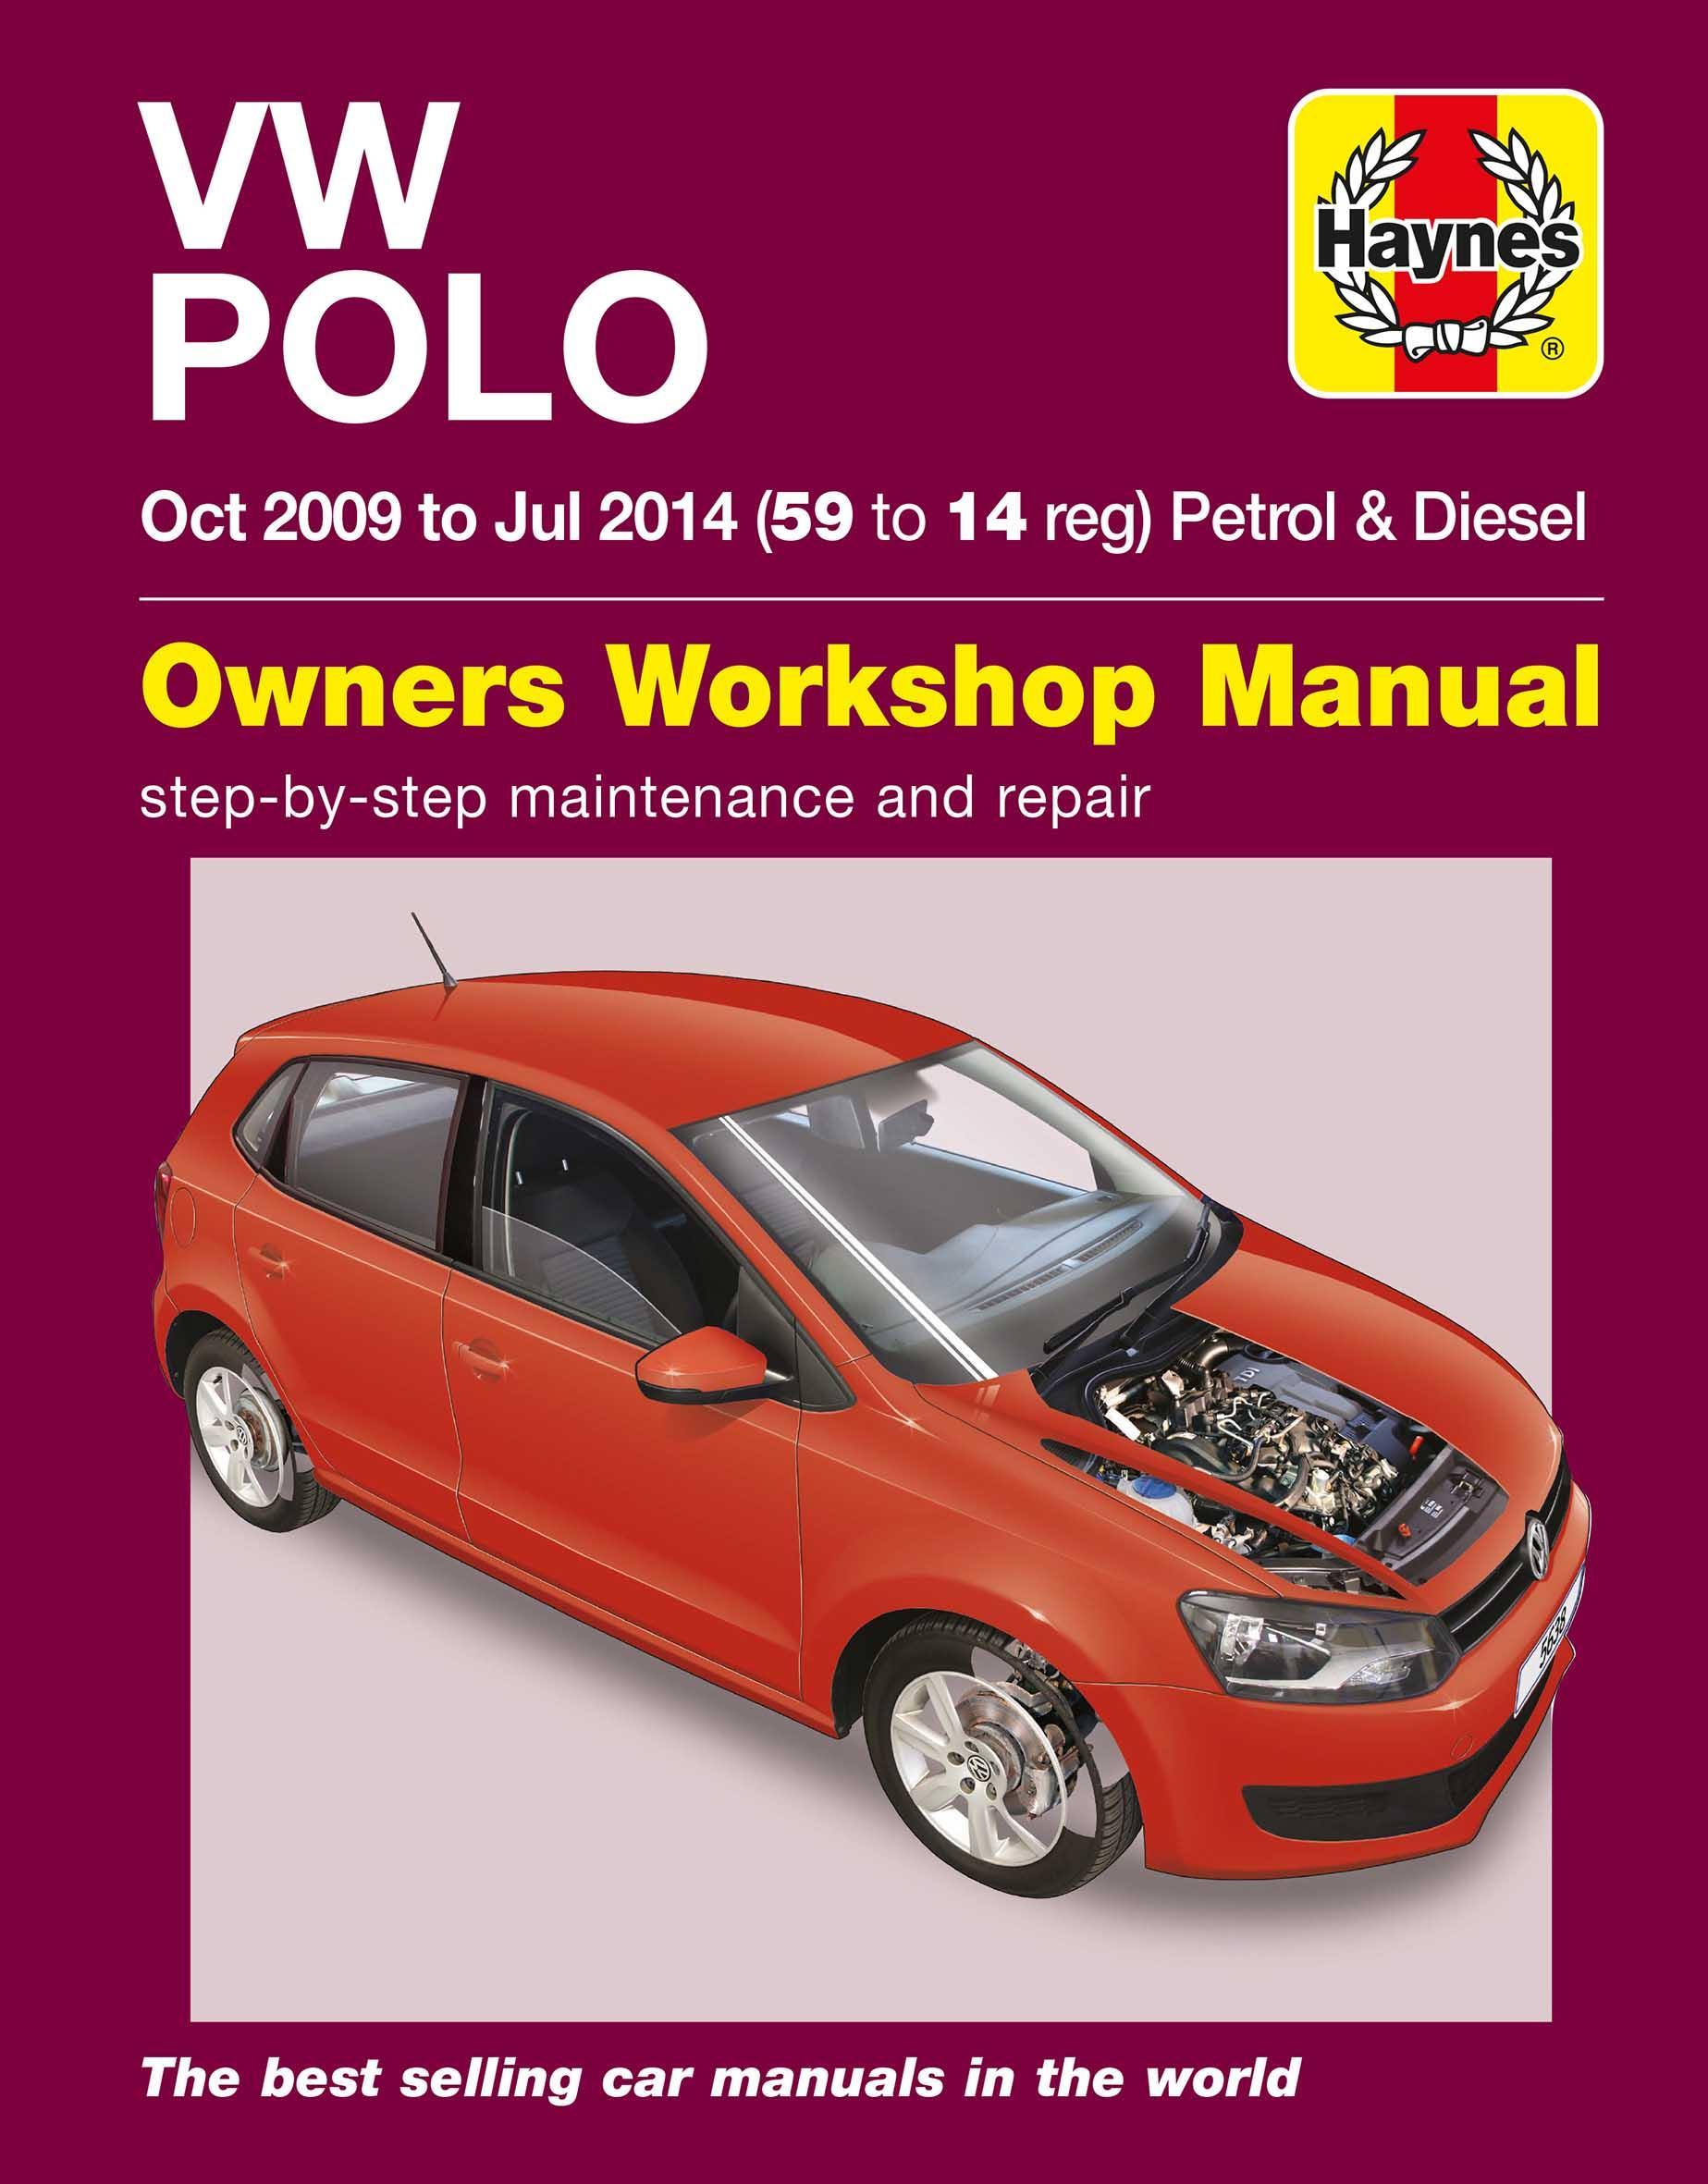 2005 vw polo workshop manual free owners manual u2022 rh wordworksbysea com VW Polo 2009 VW Polo 2003